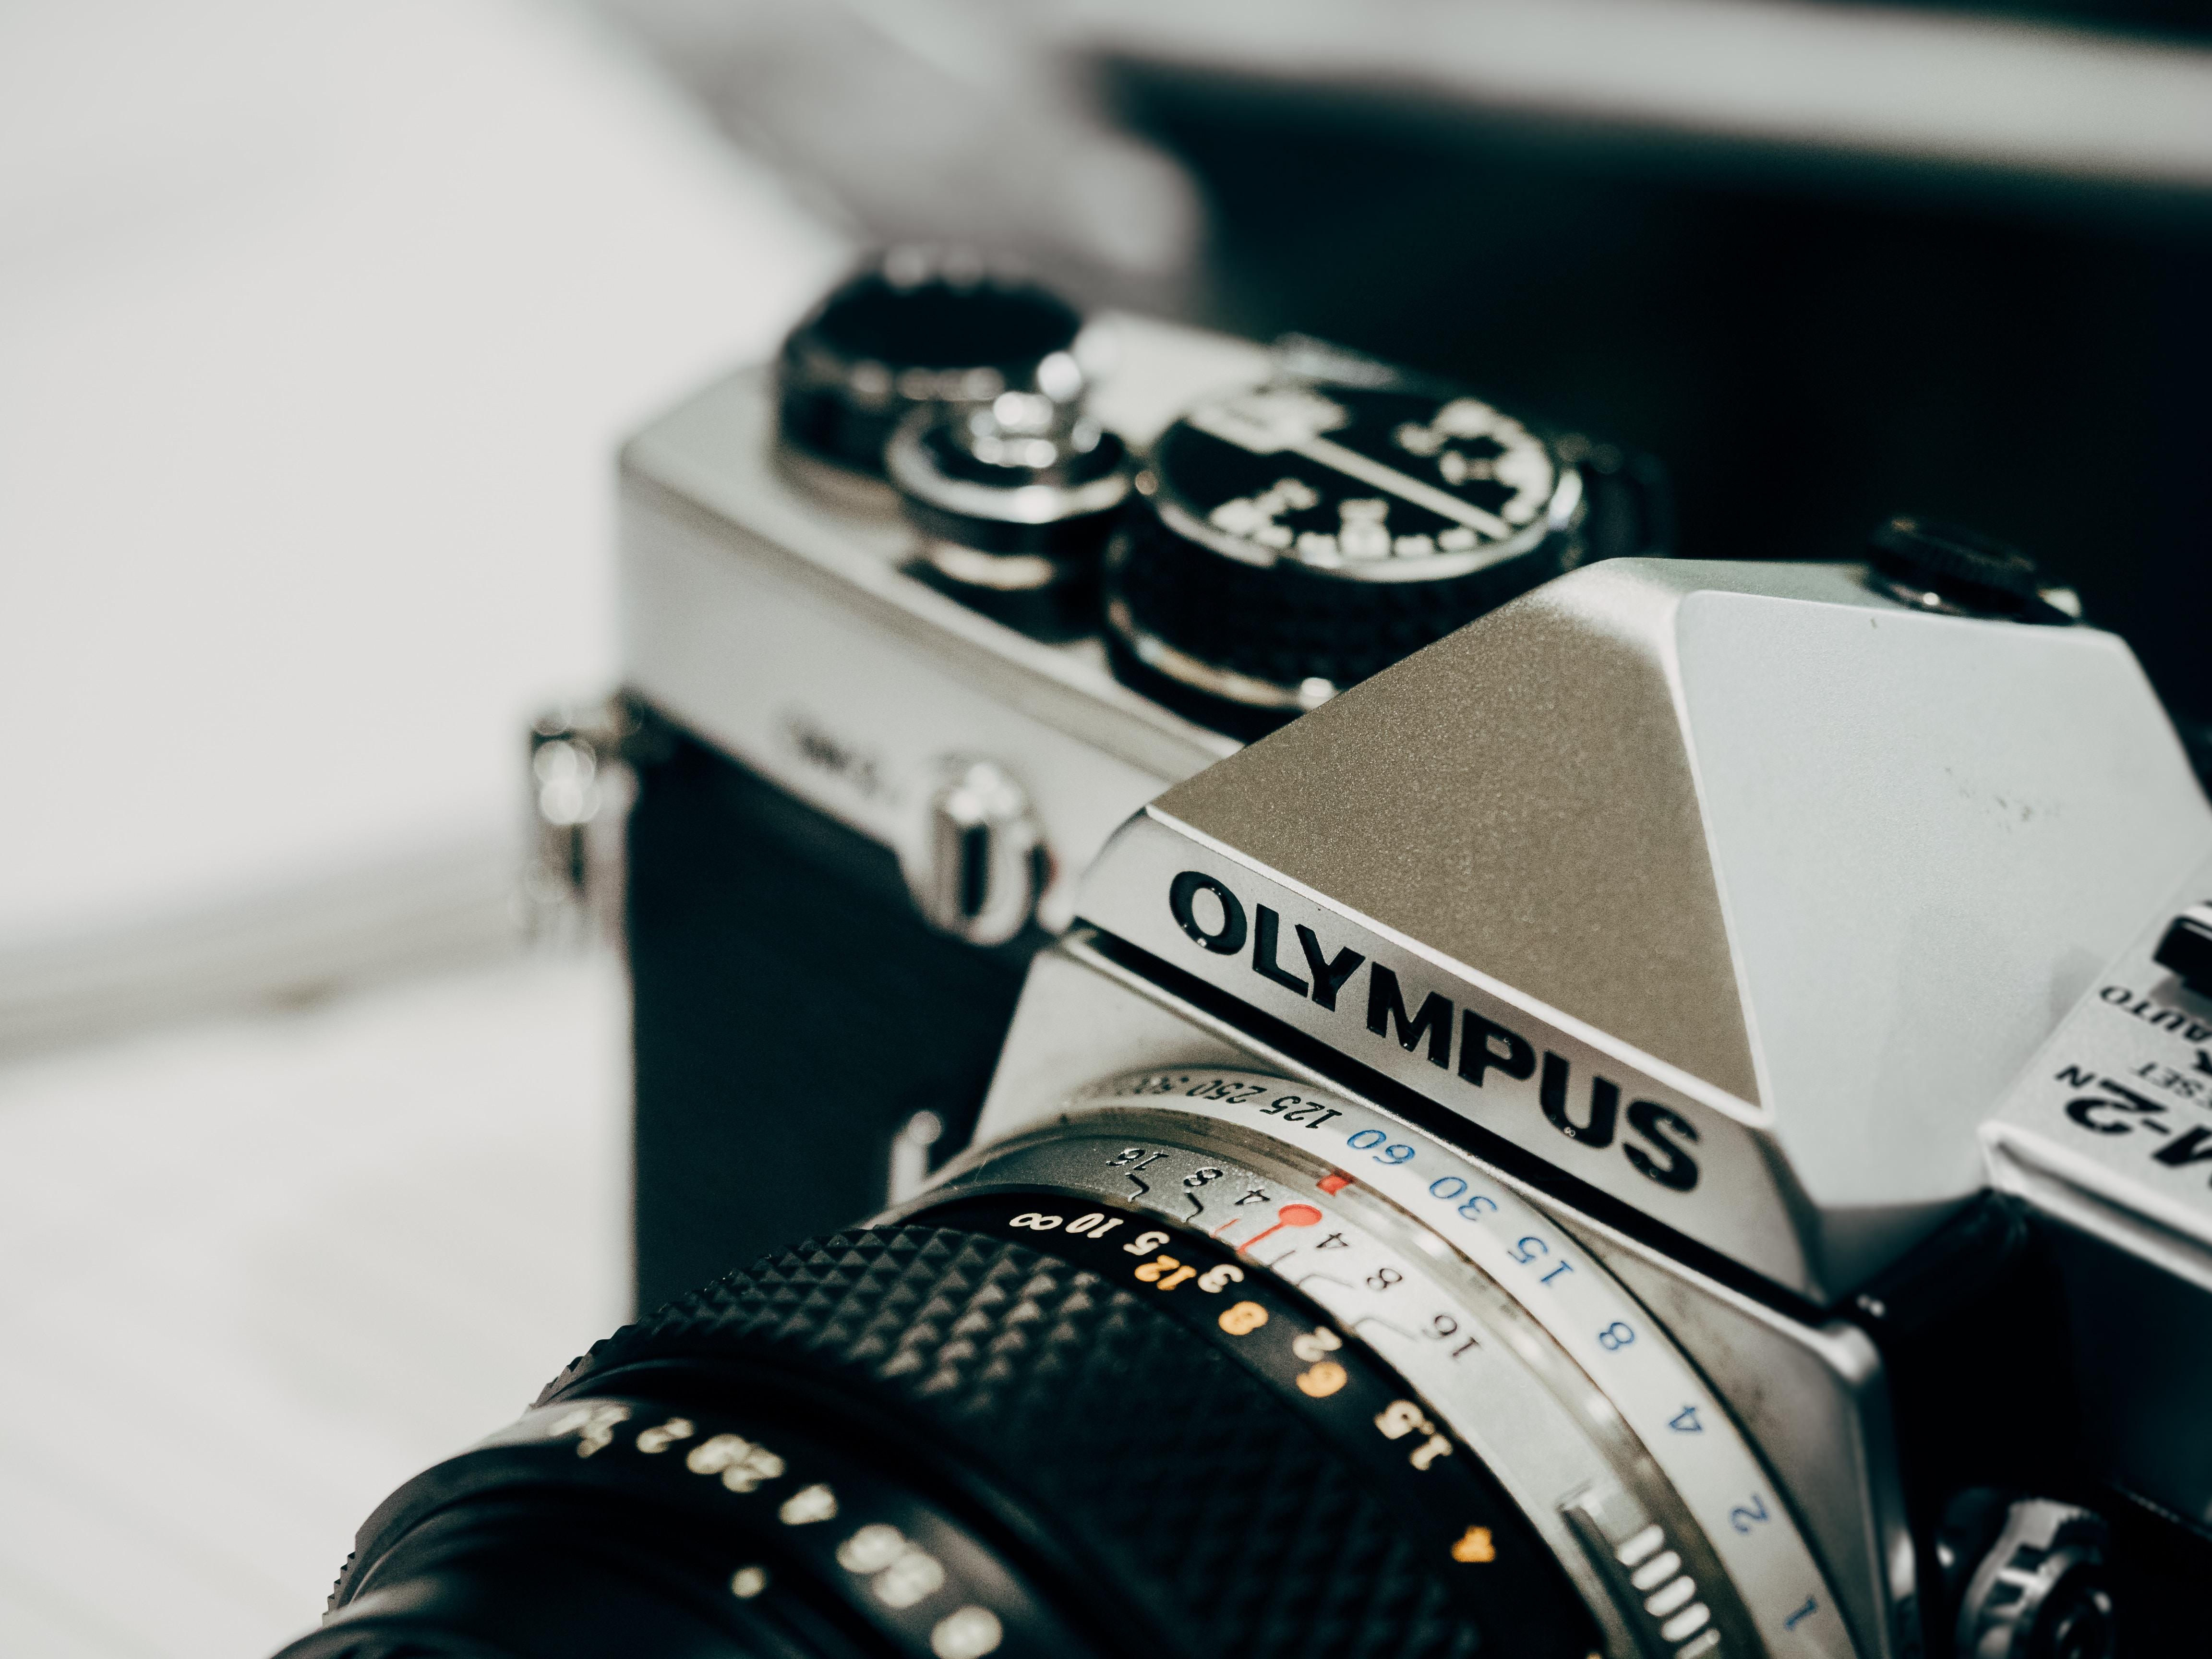 closeup photography of black and gray Olympus camera